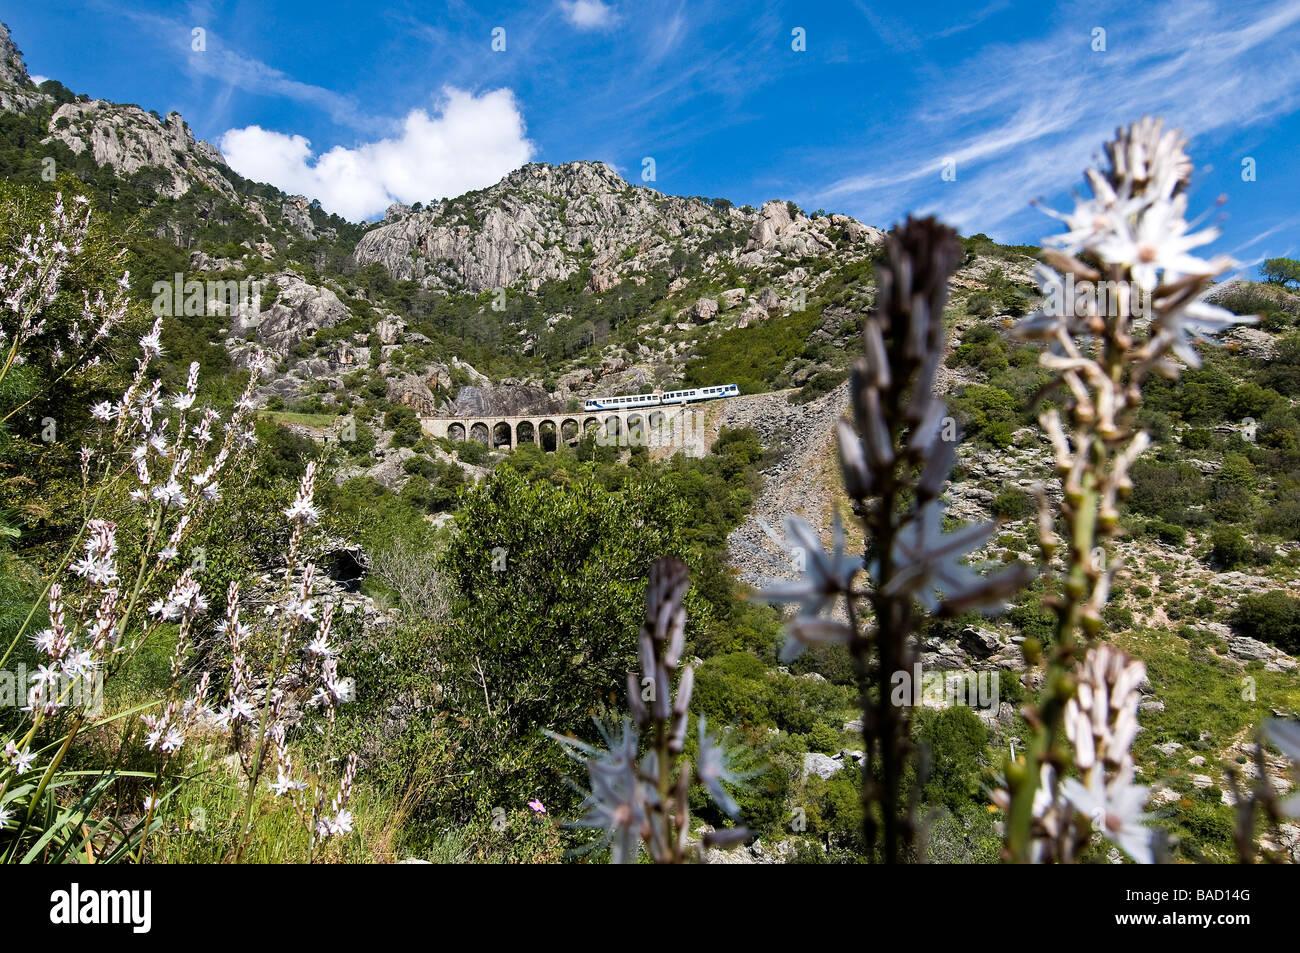 France, Haute Corse, the U Trinighellu, small train, on a viaduct before arriving at Venaco - Stock Image